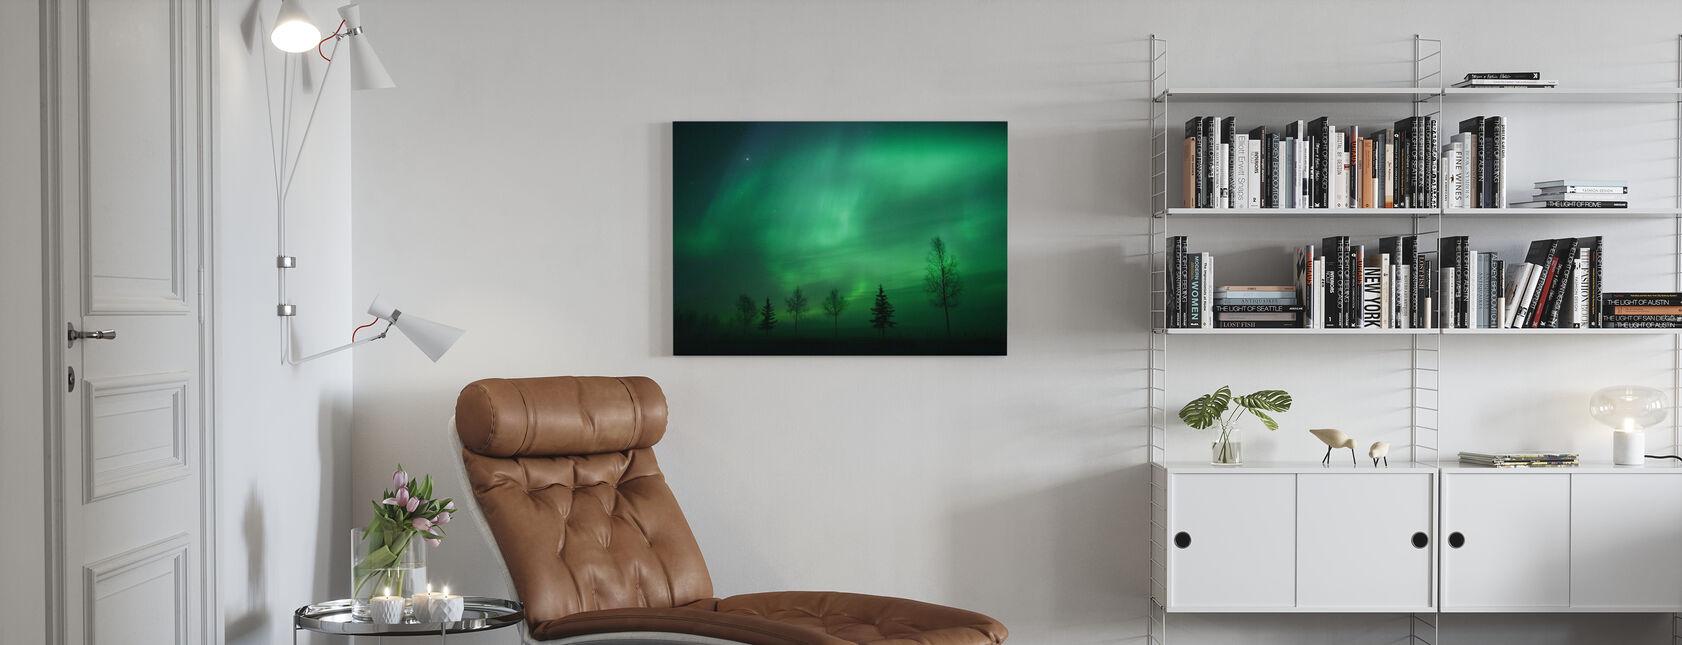 Nordic Lights - Obraz na płótnie - Pokój dzienny